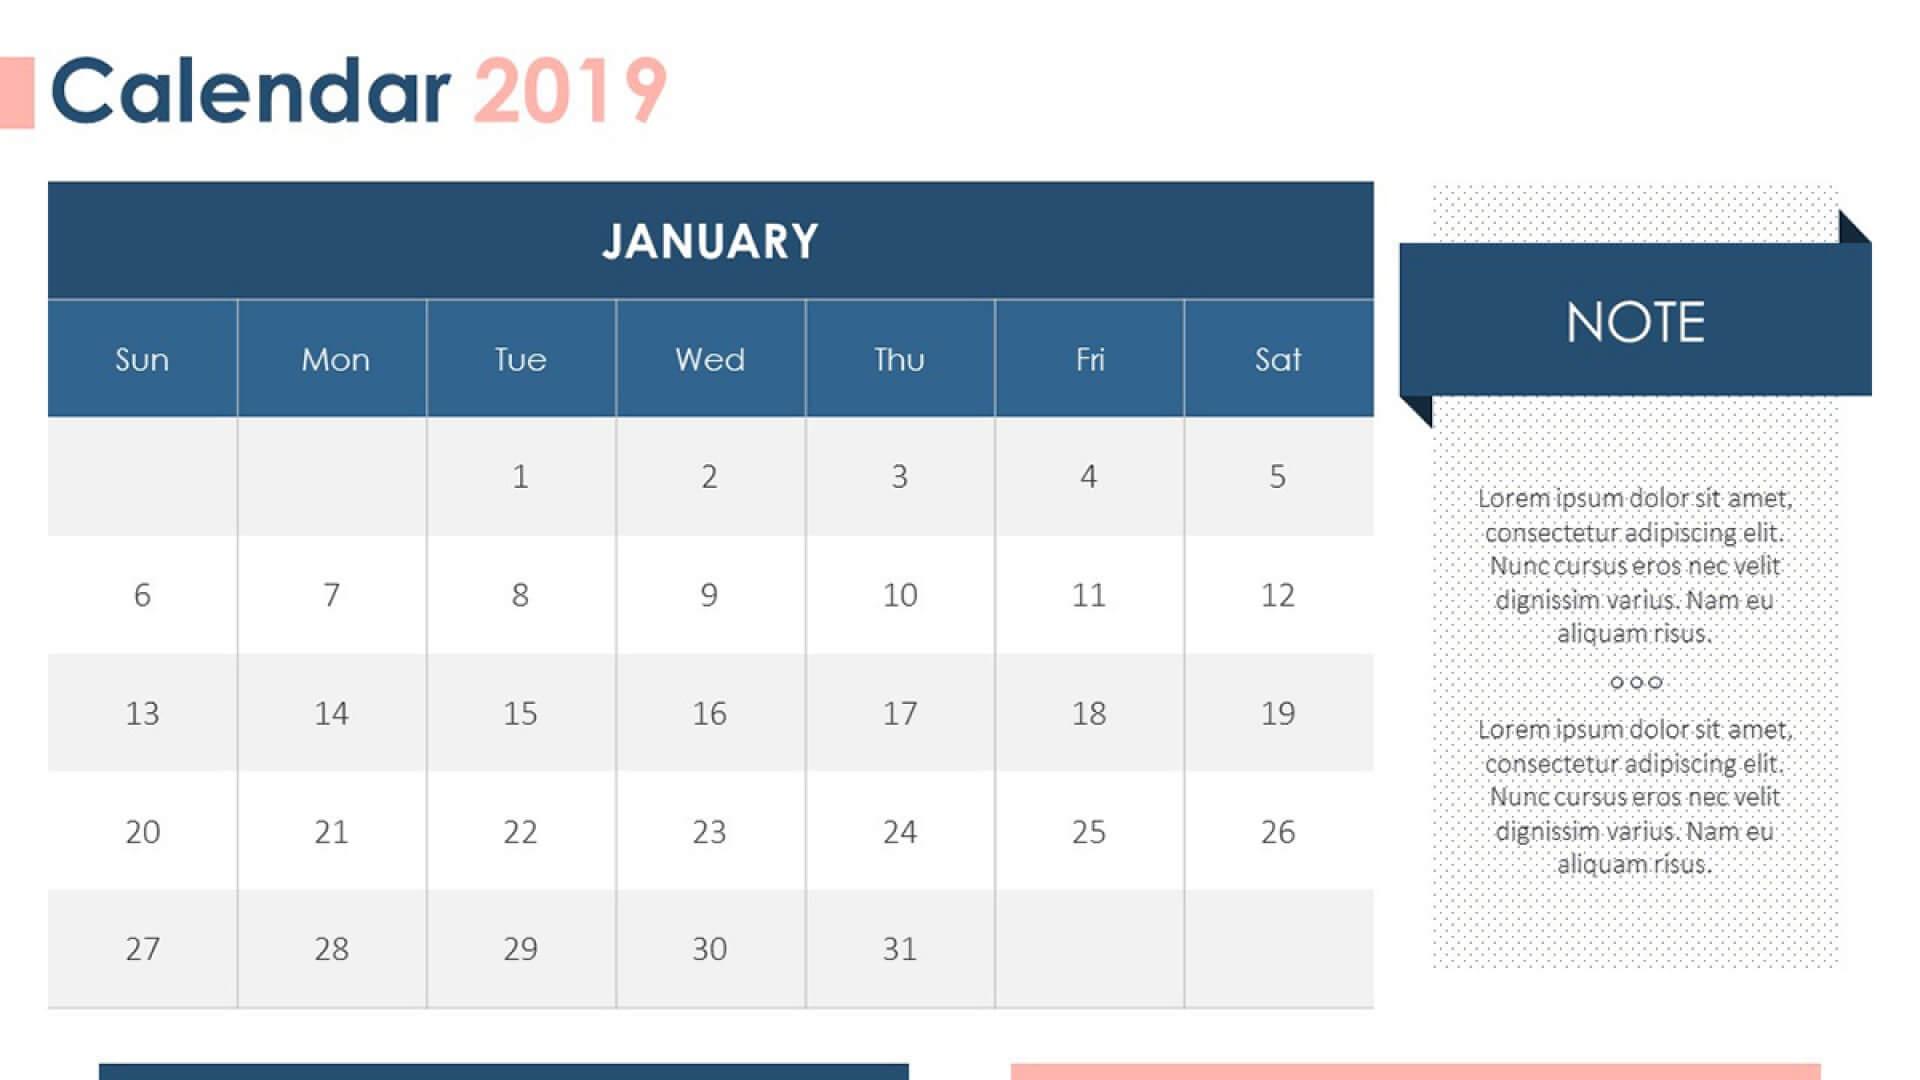 015 Calendar Powerpoint Template Templates Throughout Ideas With Regard To Microsoft Powerpoint Calendar Template